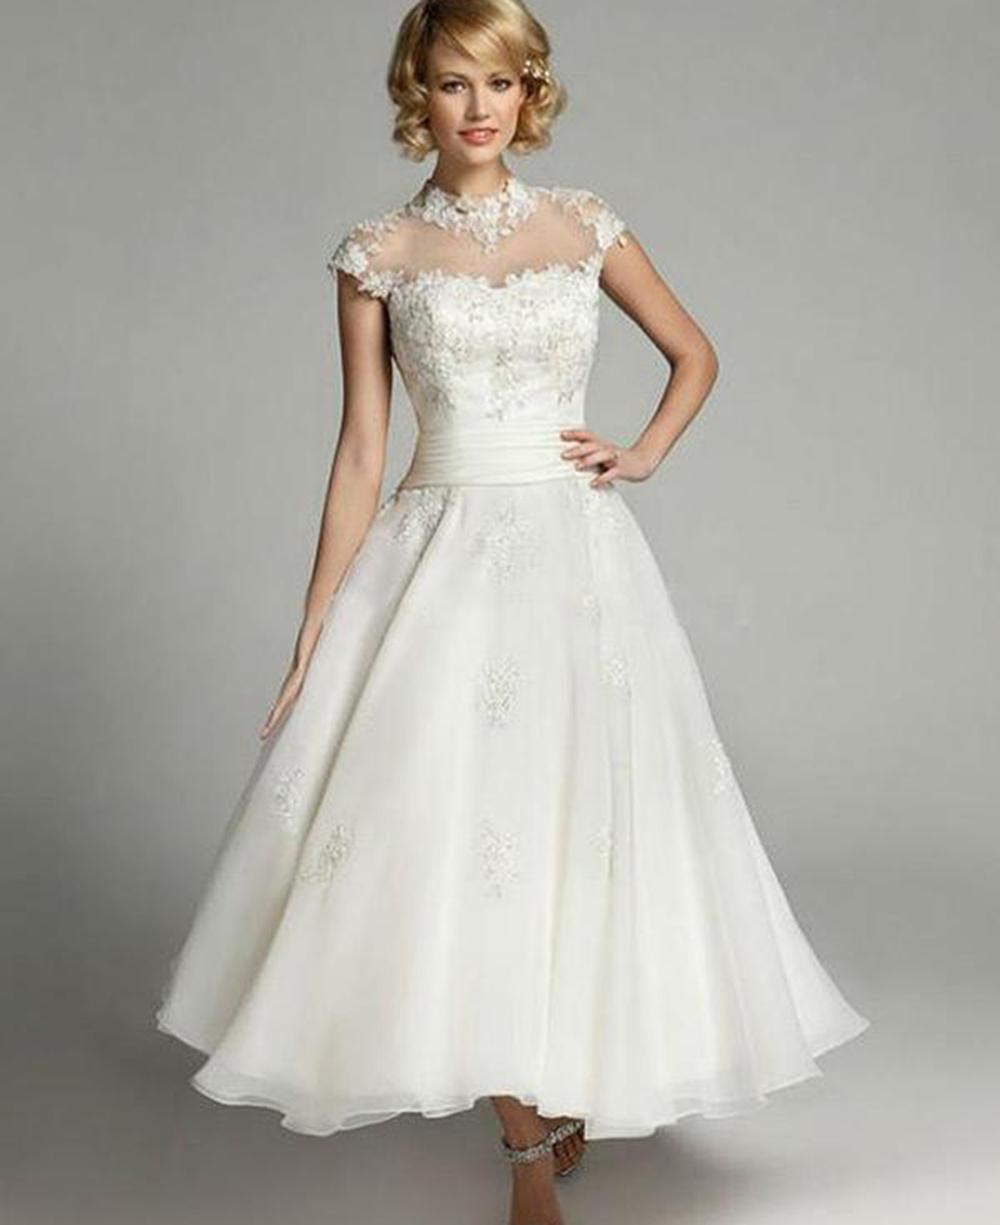 appliques lace a line wedding dresses high quality sash bridal gowns